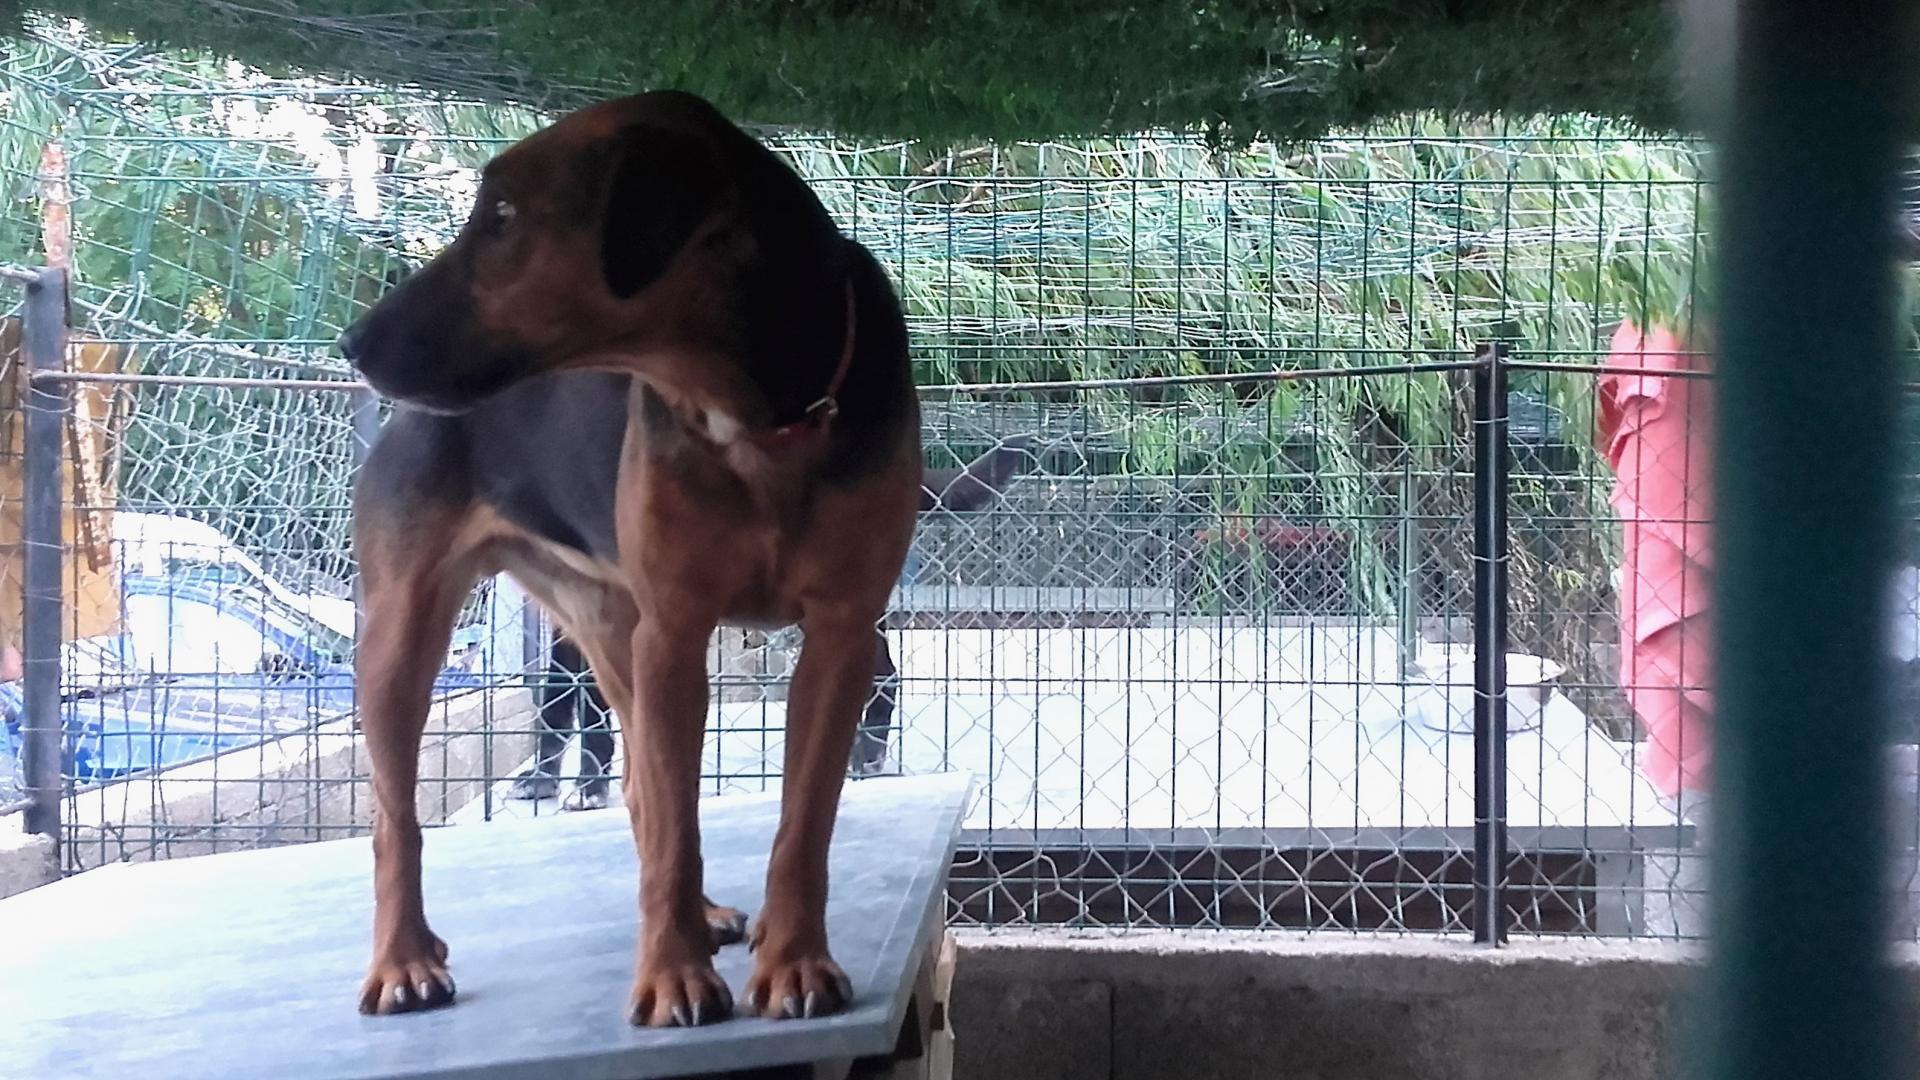 LOUSTIC - jagd terrier 8 ans (3 ans de refuge) - Refuge de Digne (04) 20160908-172405